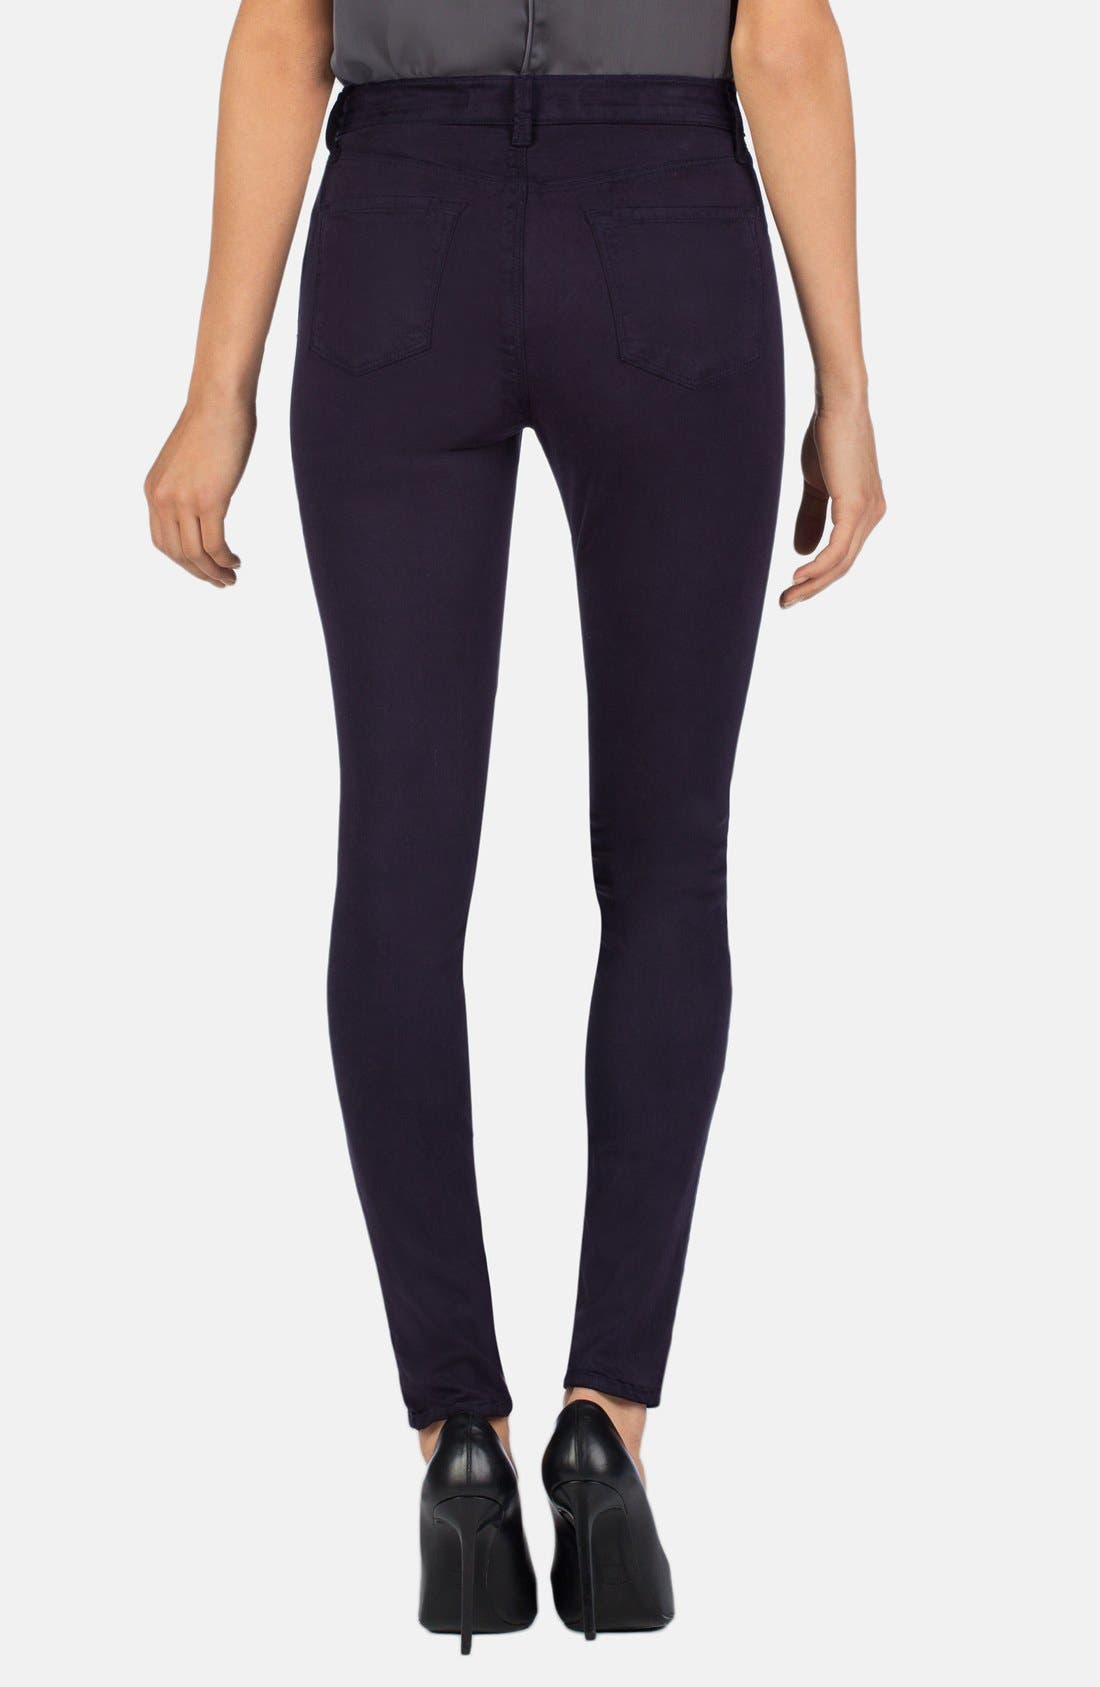 Alternate Image 2  - J Brand '485' Mid Rise Super Skinny Jeans (Blackberry)